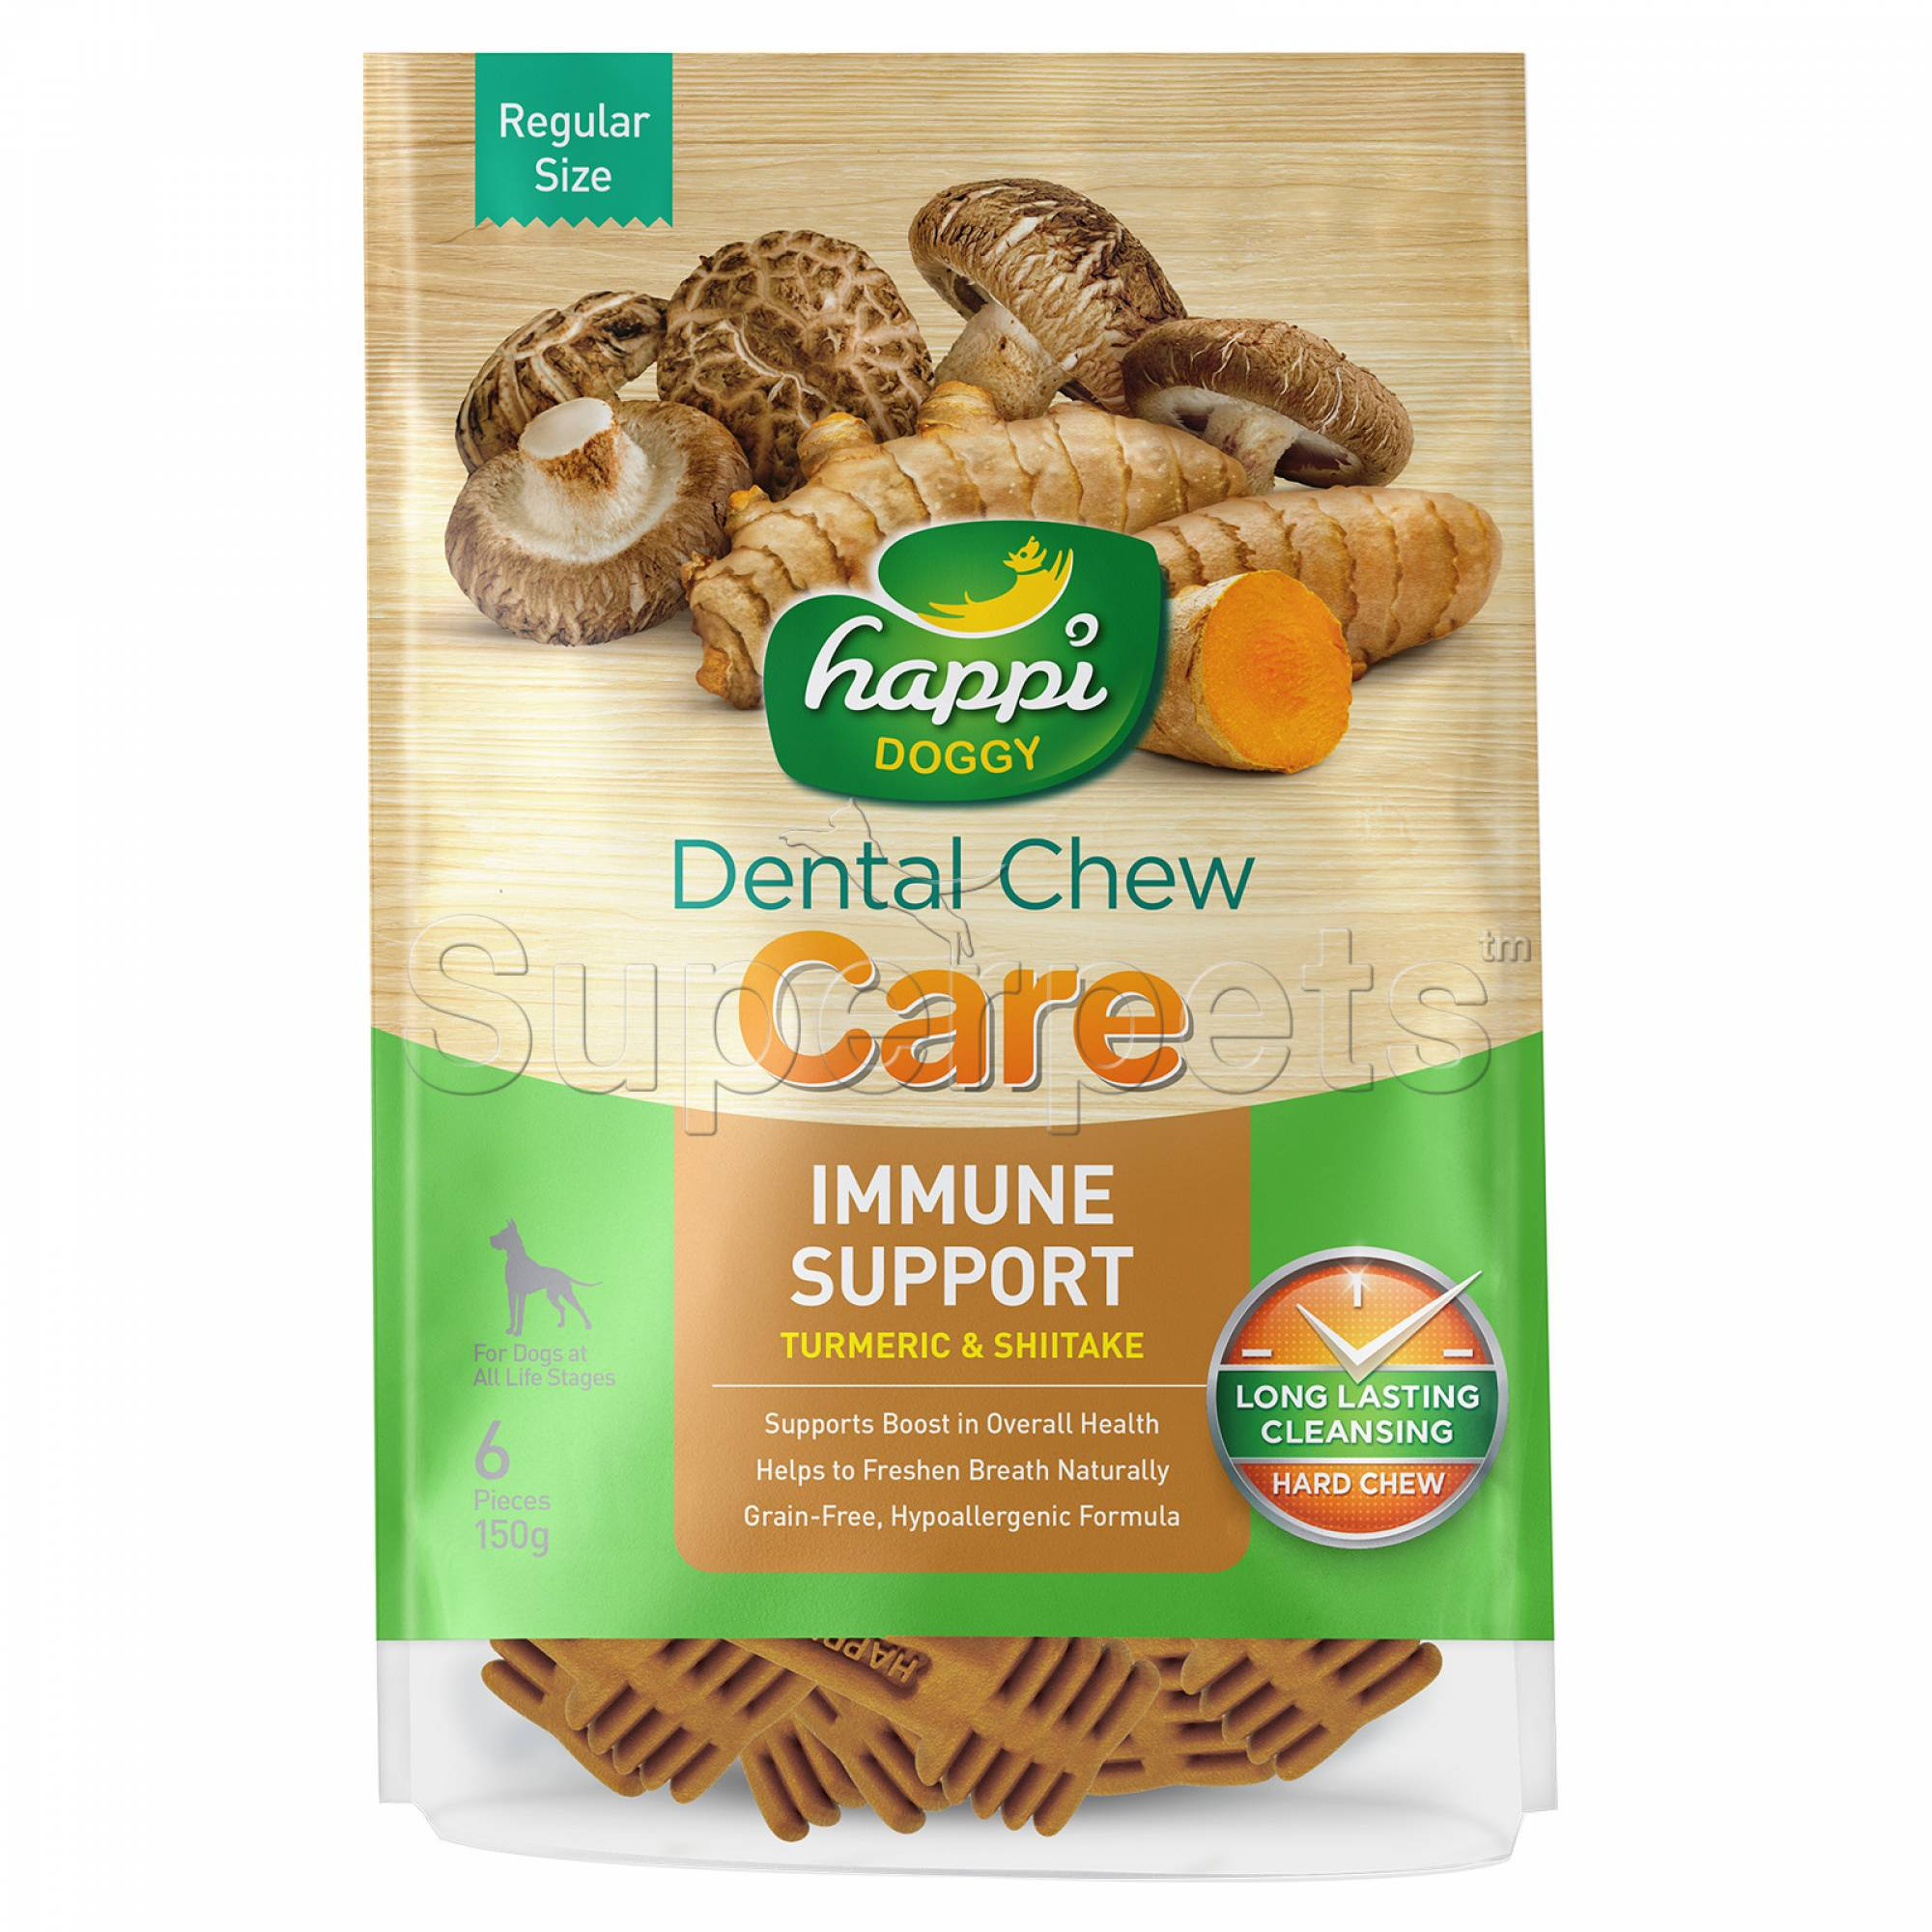 Happi Doggy H312 Dental Chew Care (Immune Support) Regular Size 6pcs 150g